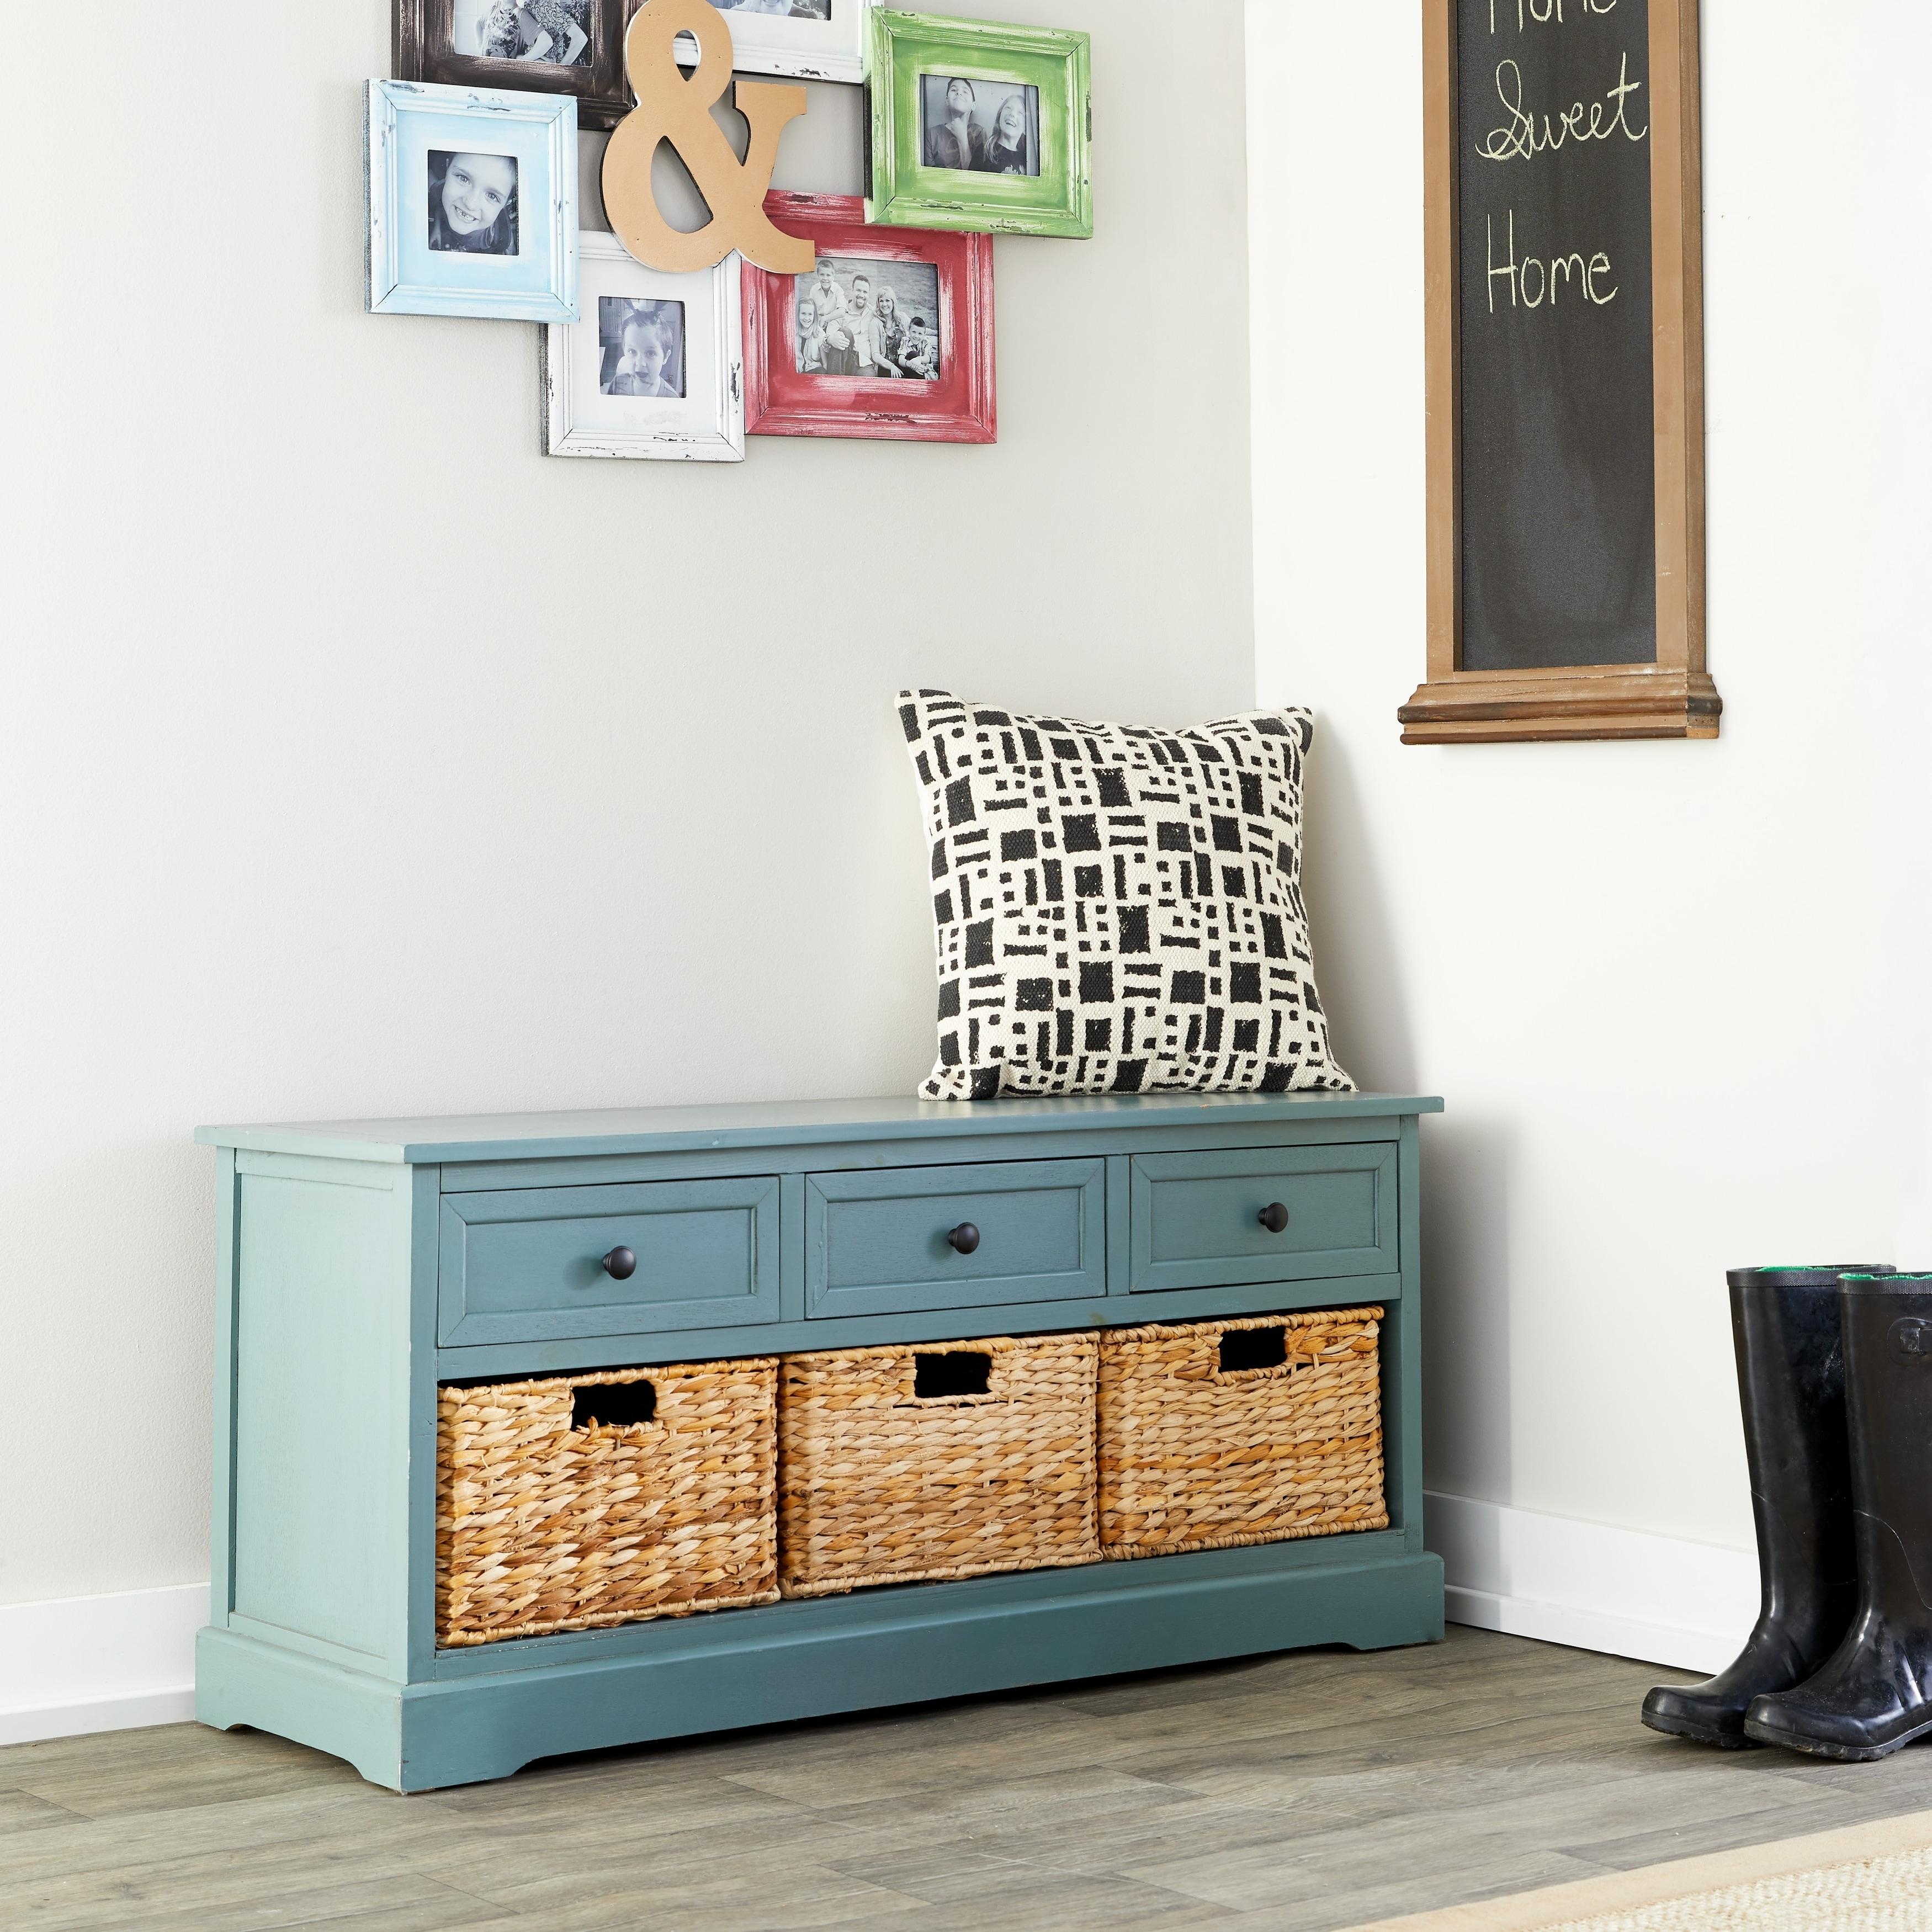 Studio 350 WD 3 Basket Cabinet 20-inch (see description),...